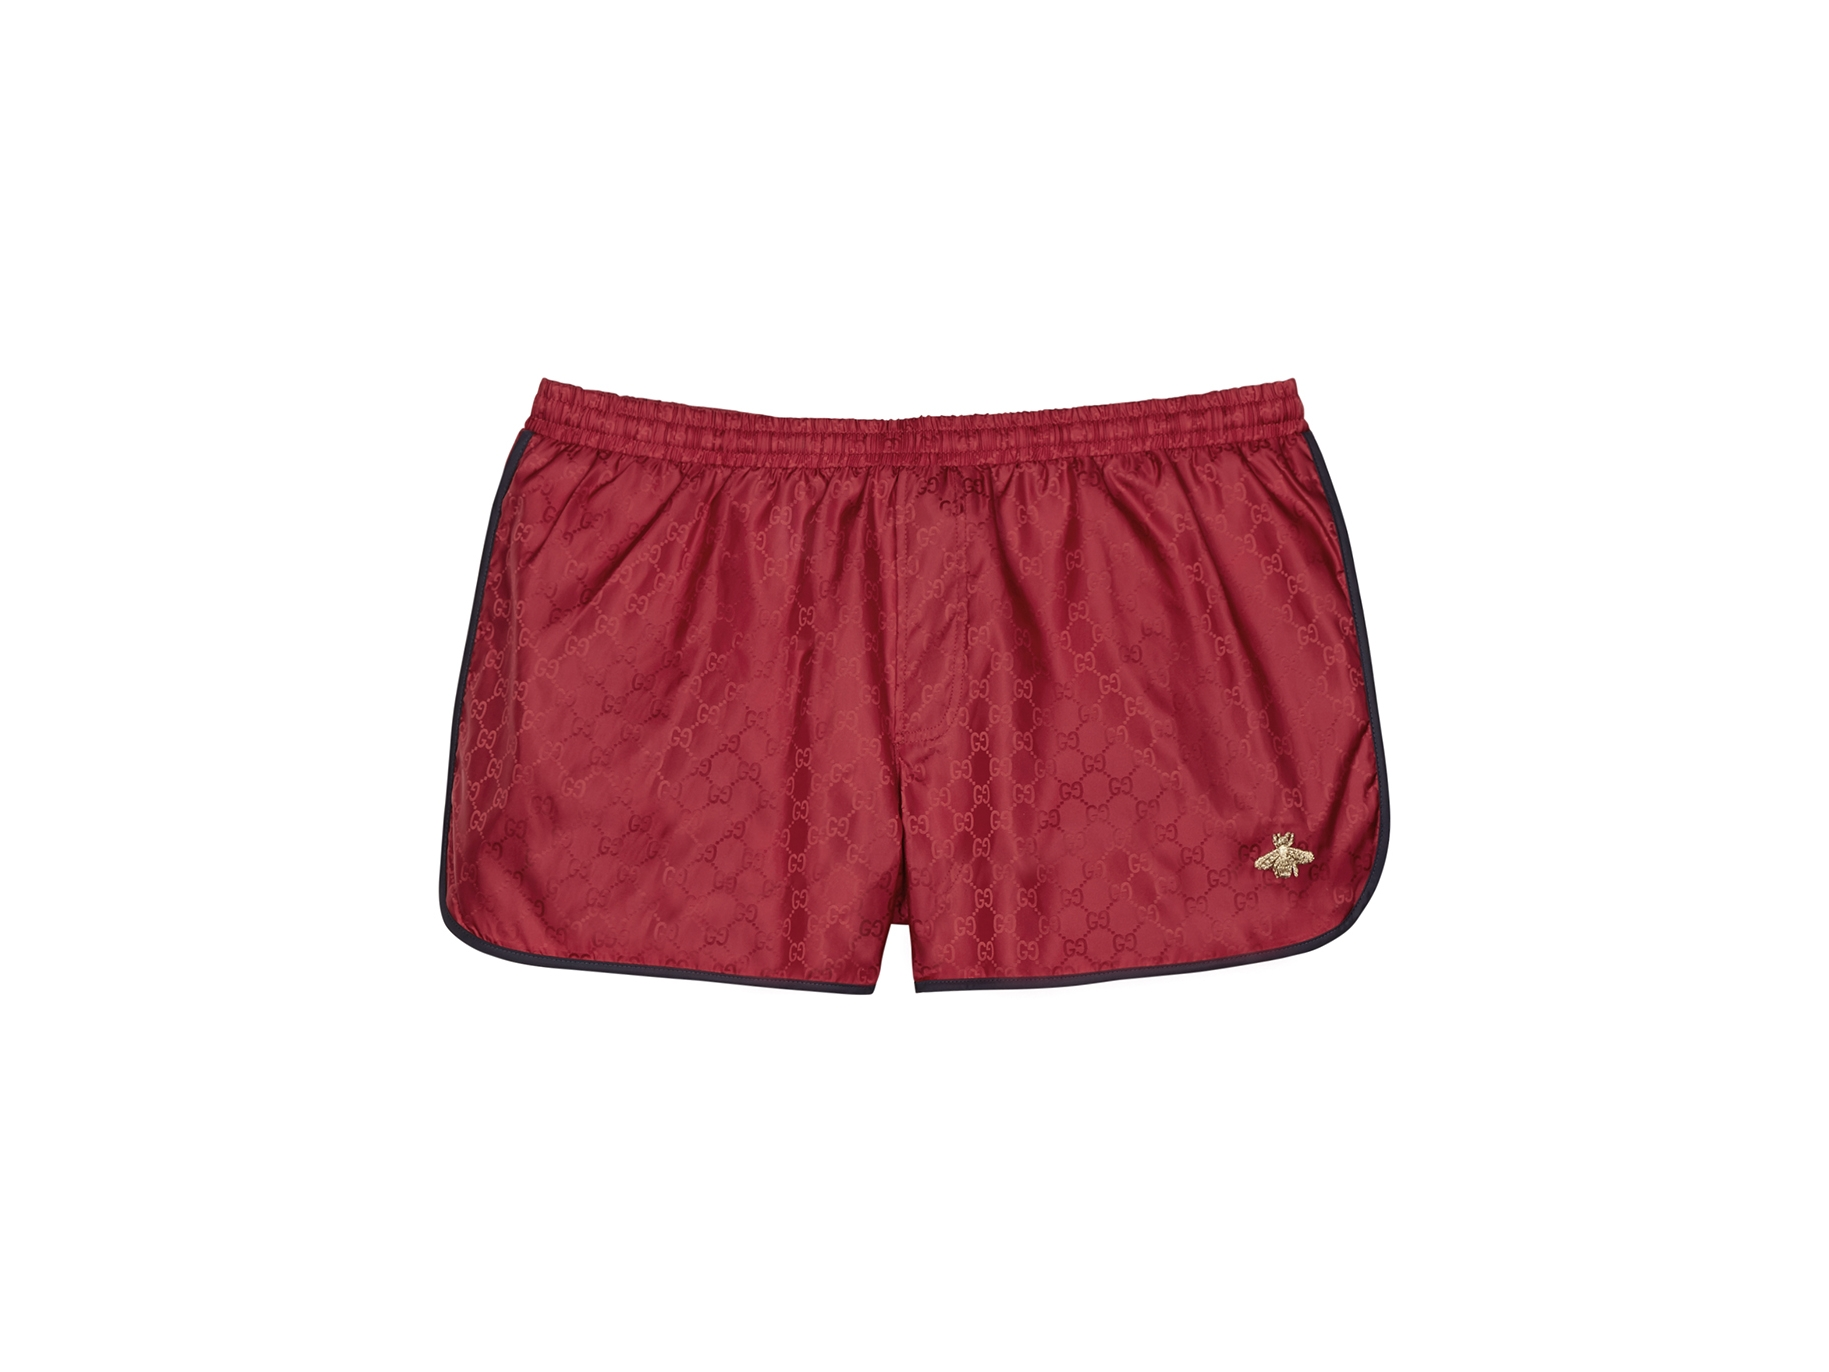 0d3cfc9a2e4 Gucci GG jacquard swim shorts - Harvey Nichols